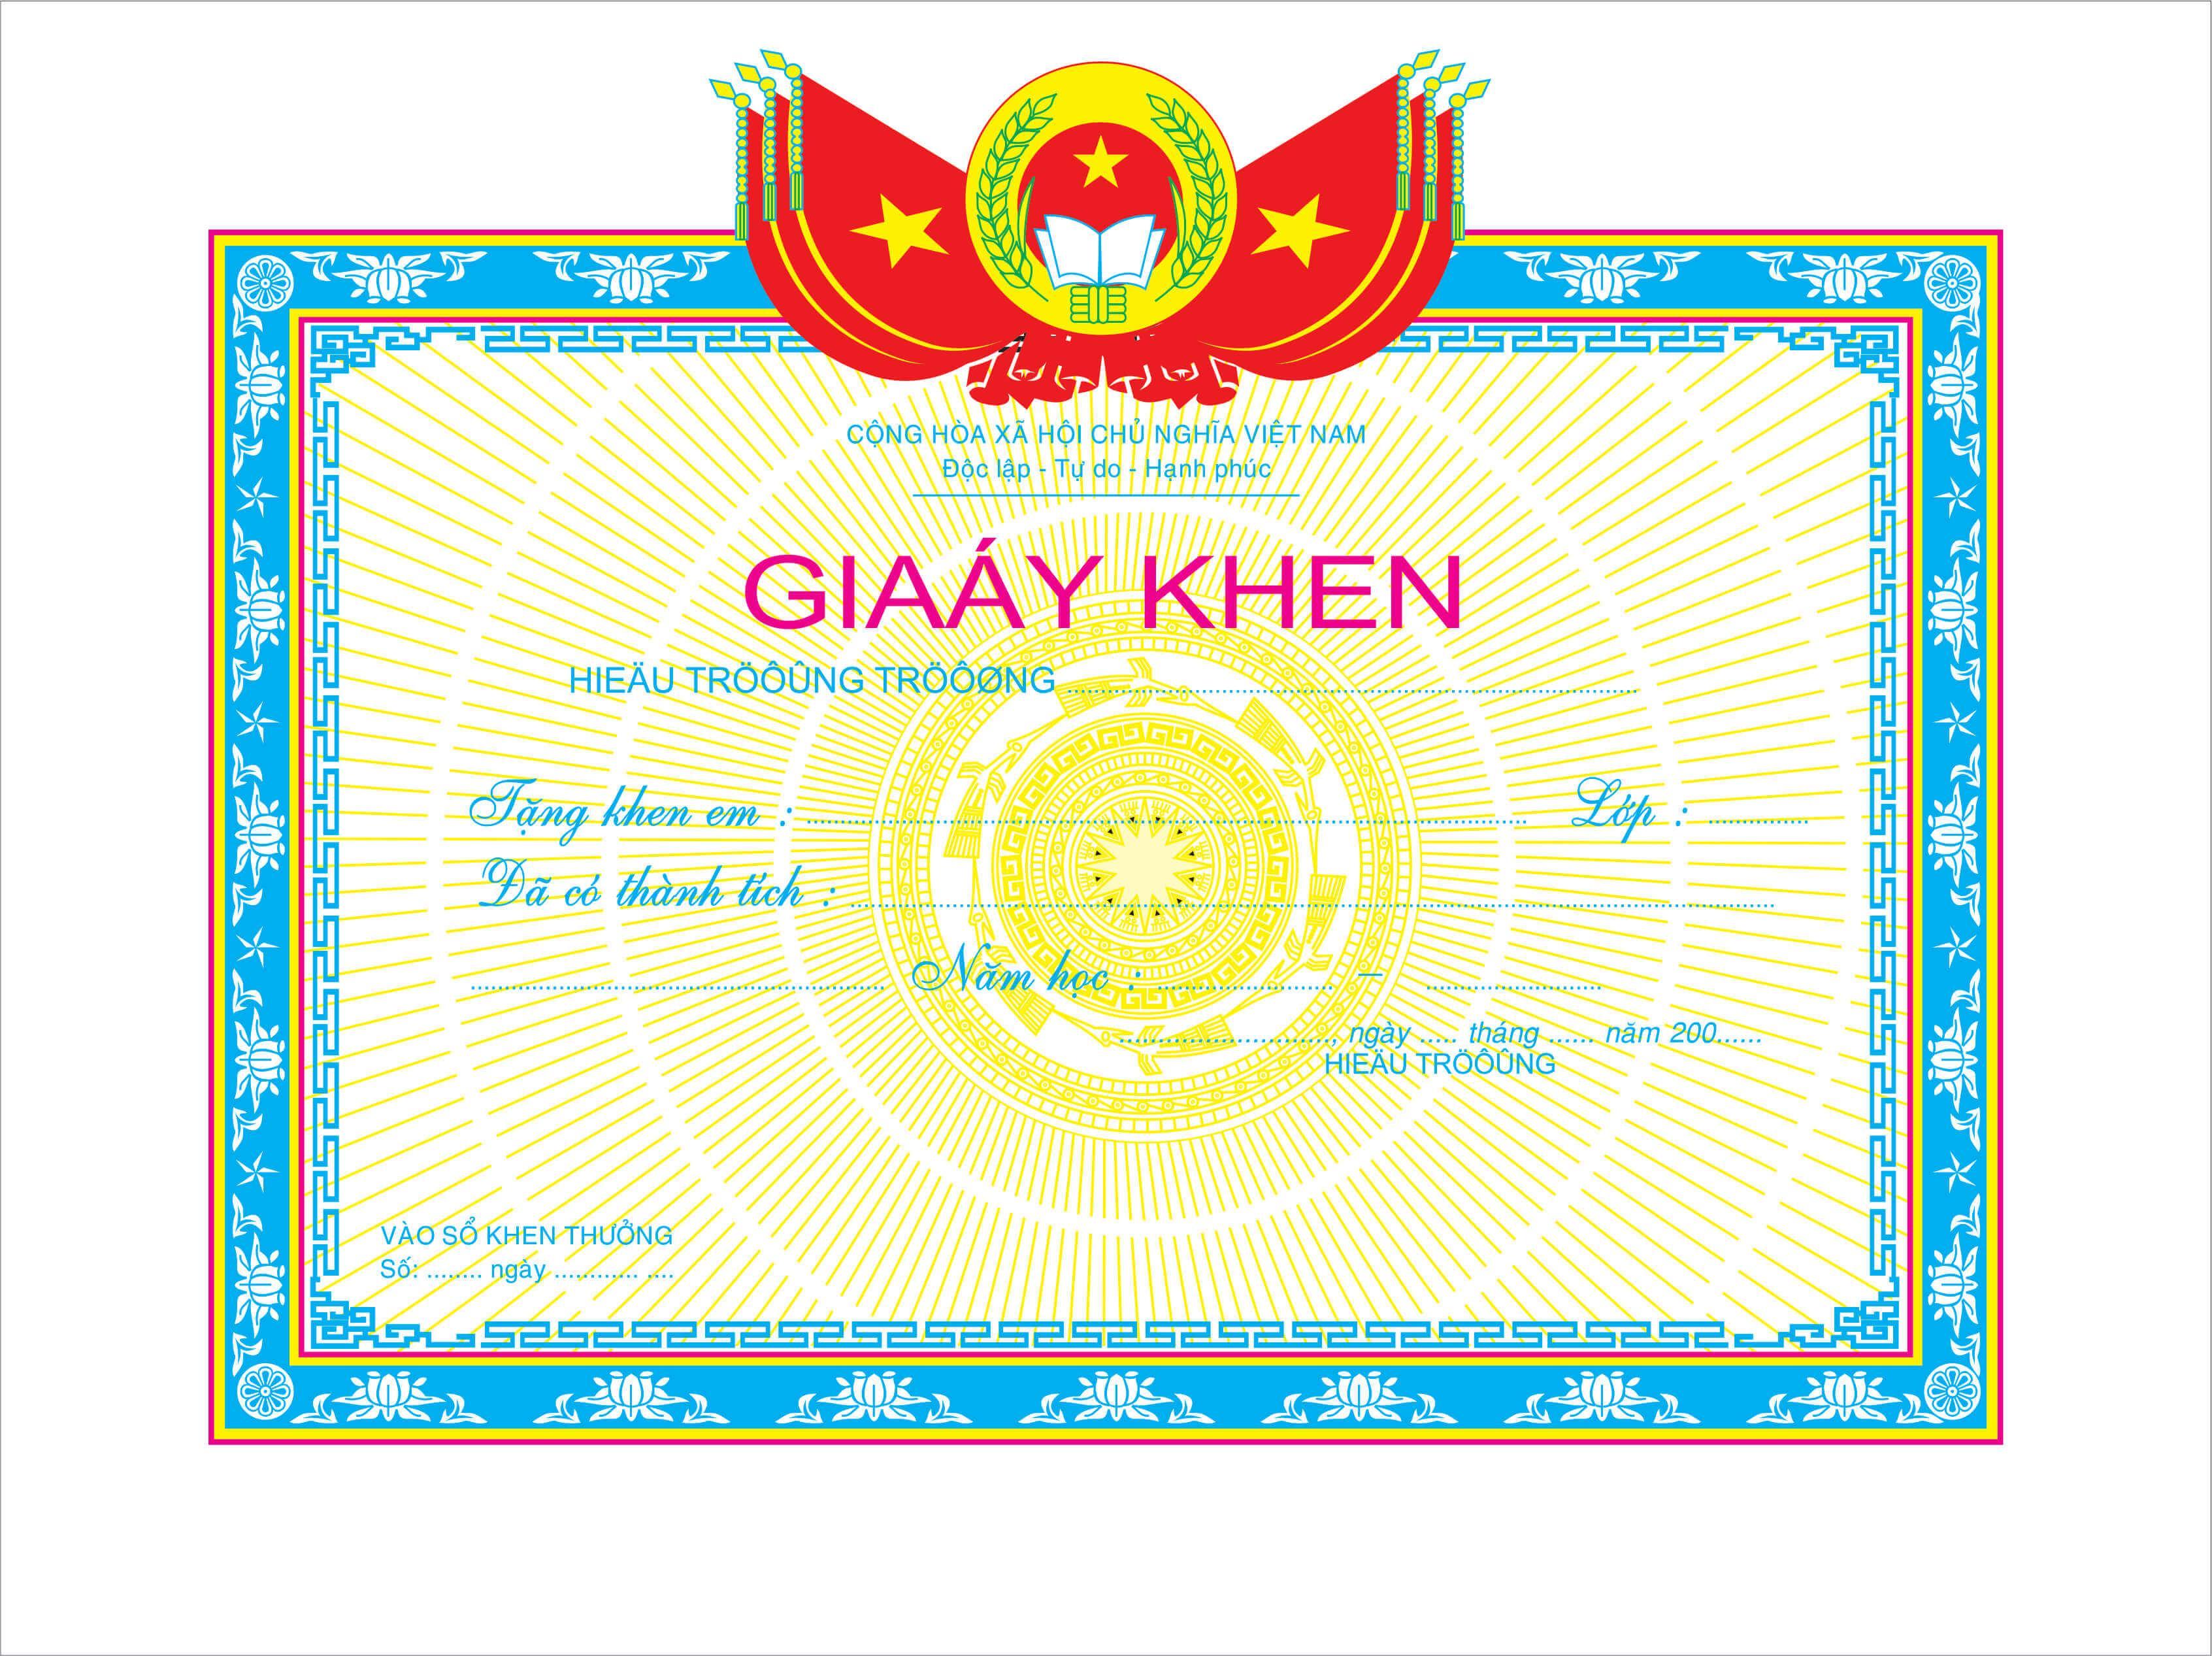 Mẫu giấy khen 002 - mẫu giấy khen trường học - Link Download : https://adsnew.net/SvvGH67